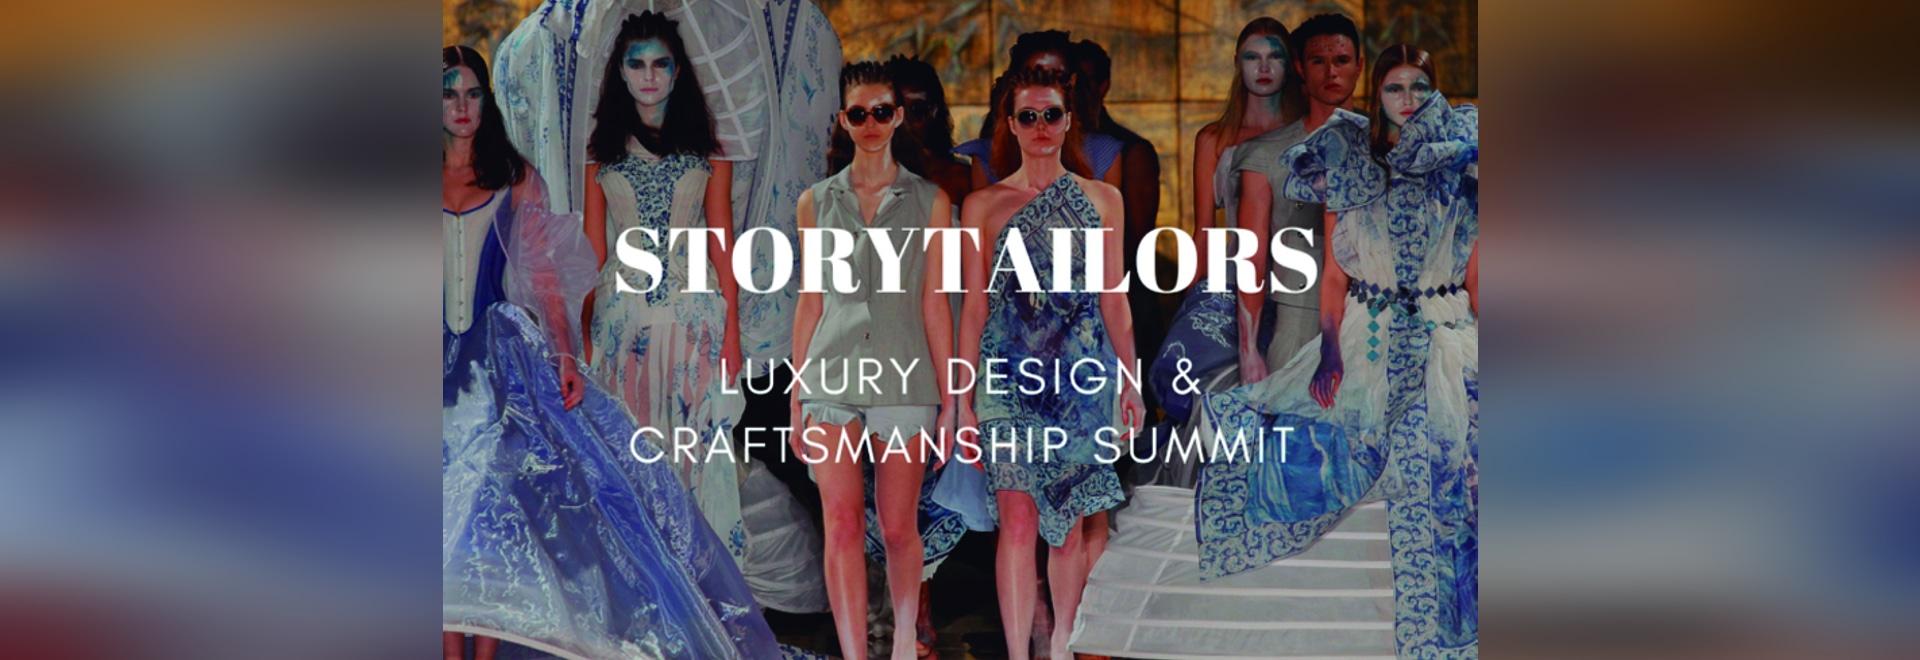 Luxury Design & Craftsmanship Summit Speakers: Storytailors